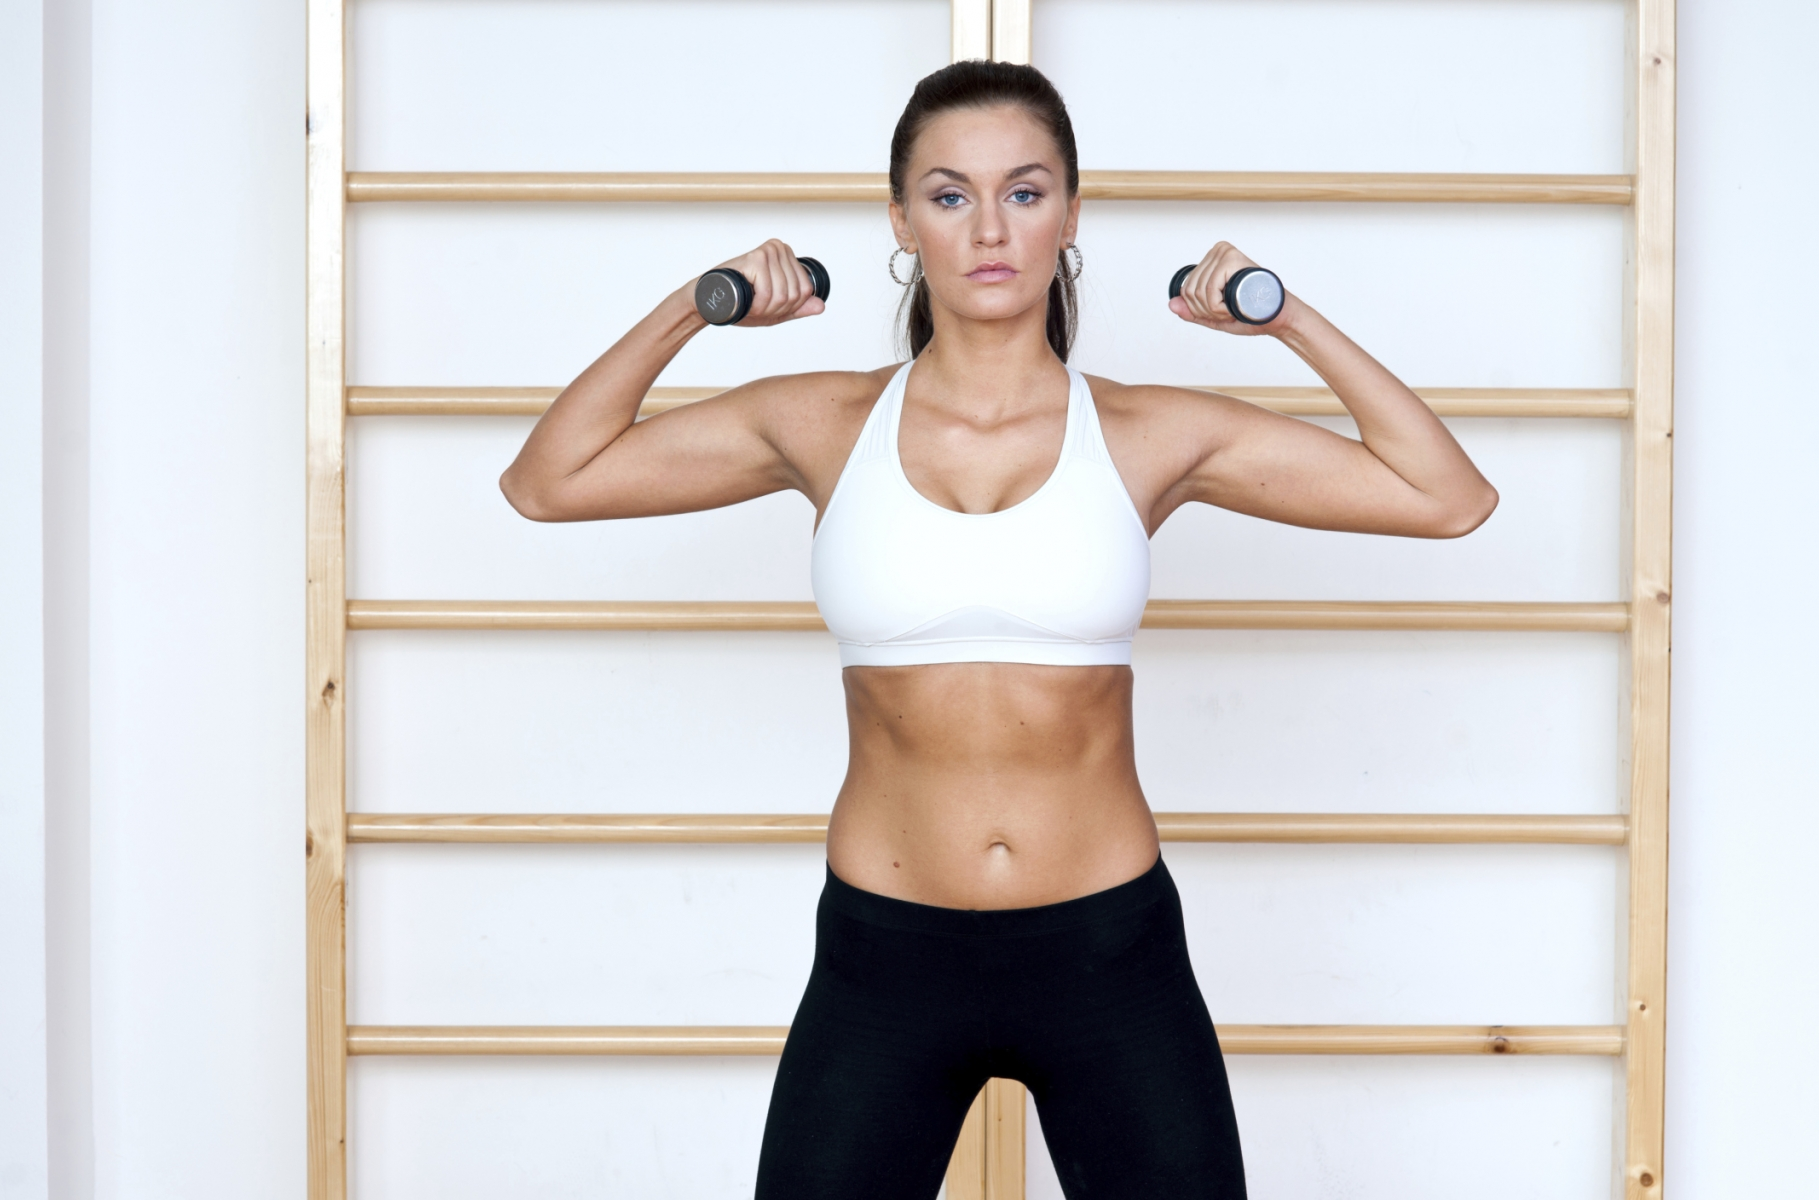 Proteinas para mujeres adelgazar muslos